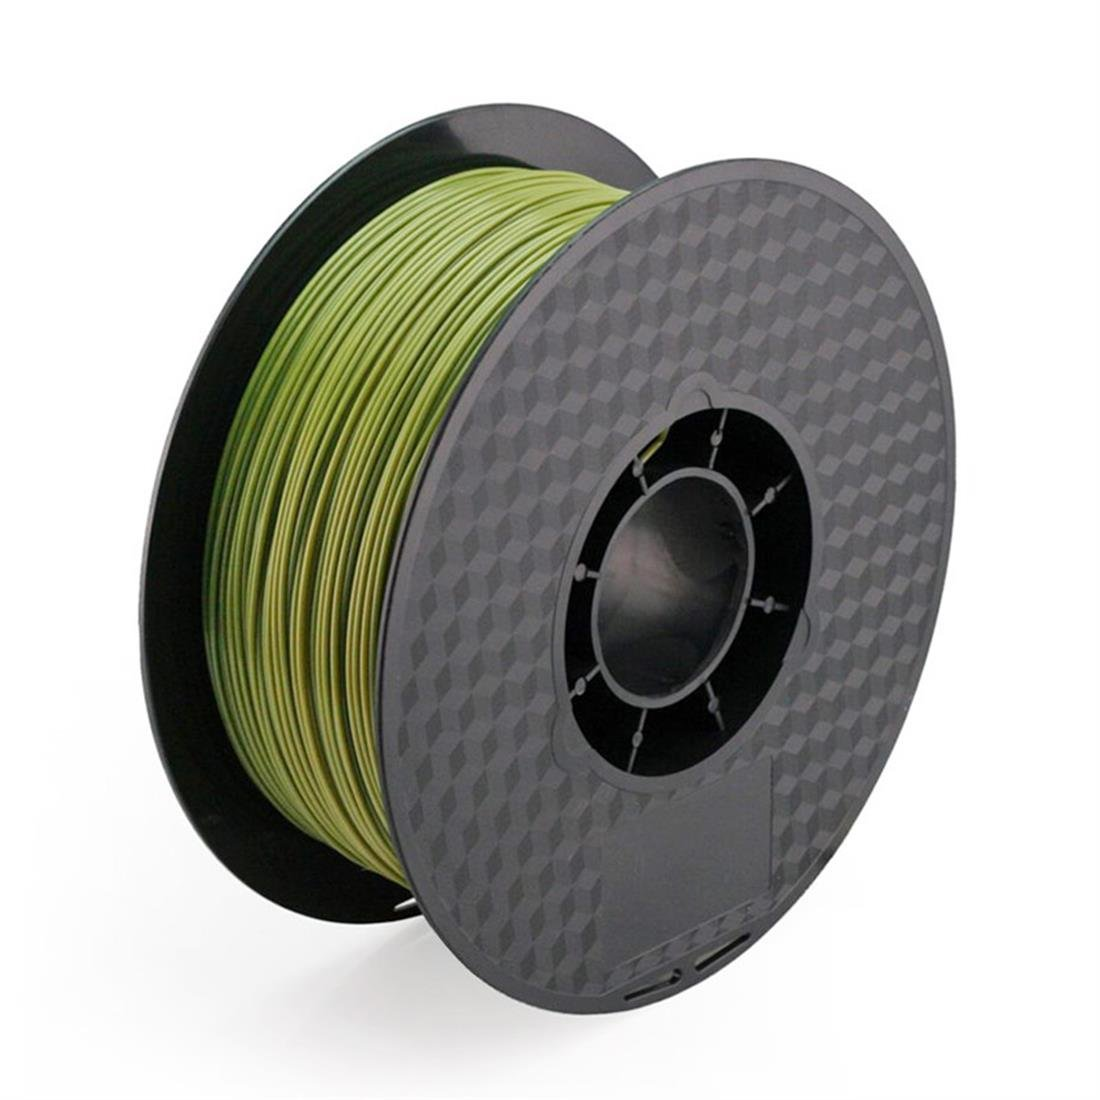 Uniqstore 3D-Drucker Material 1,0 kg 2,2 lb 1.75 mm Armee grün PLA Filament Military Green Direct Hersteller Grün